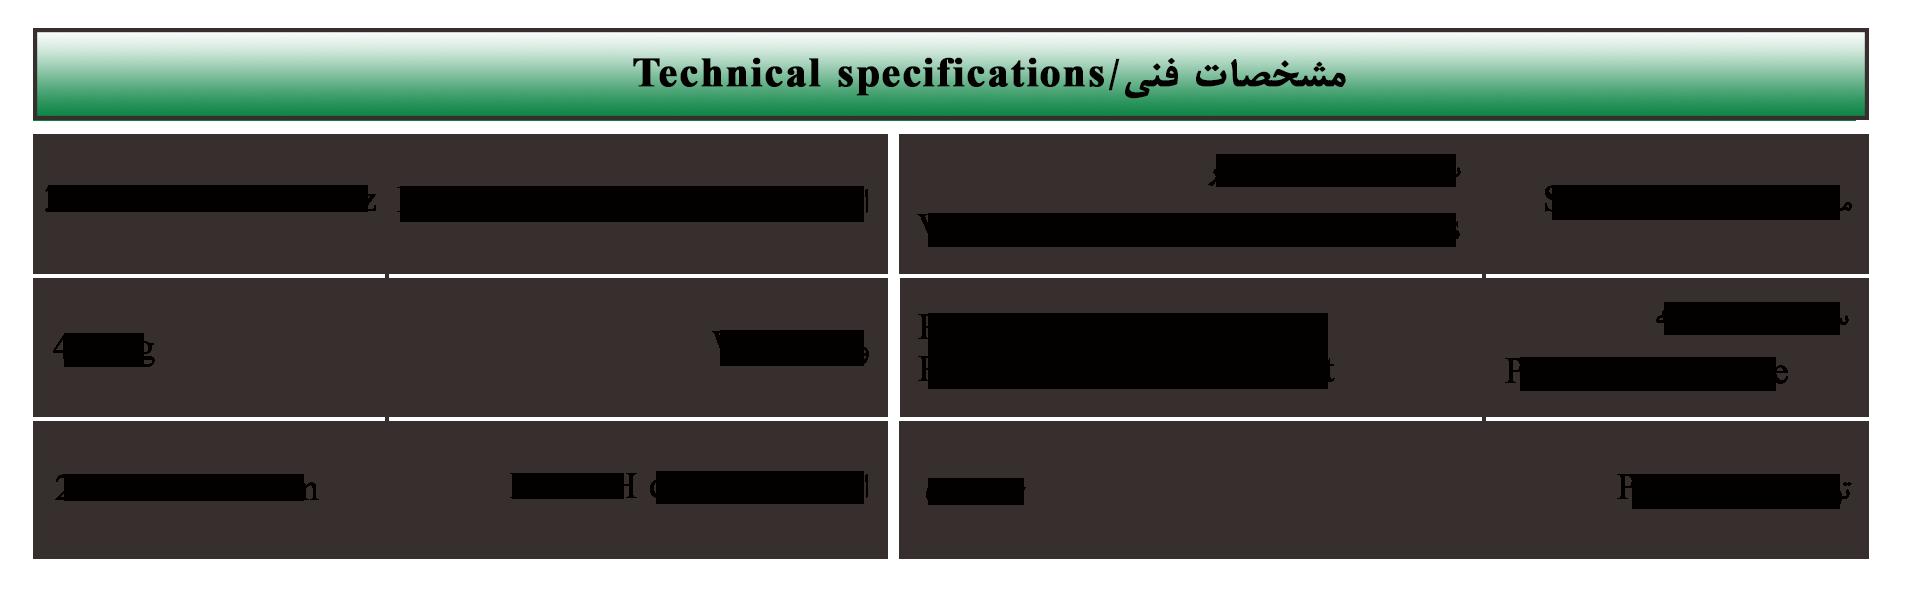 مشخصات فنی ماشین خاک پرکن گلخانه تیداپارس